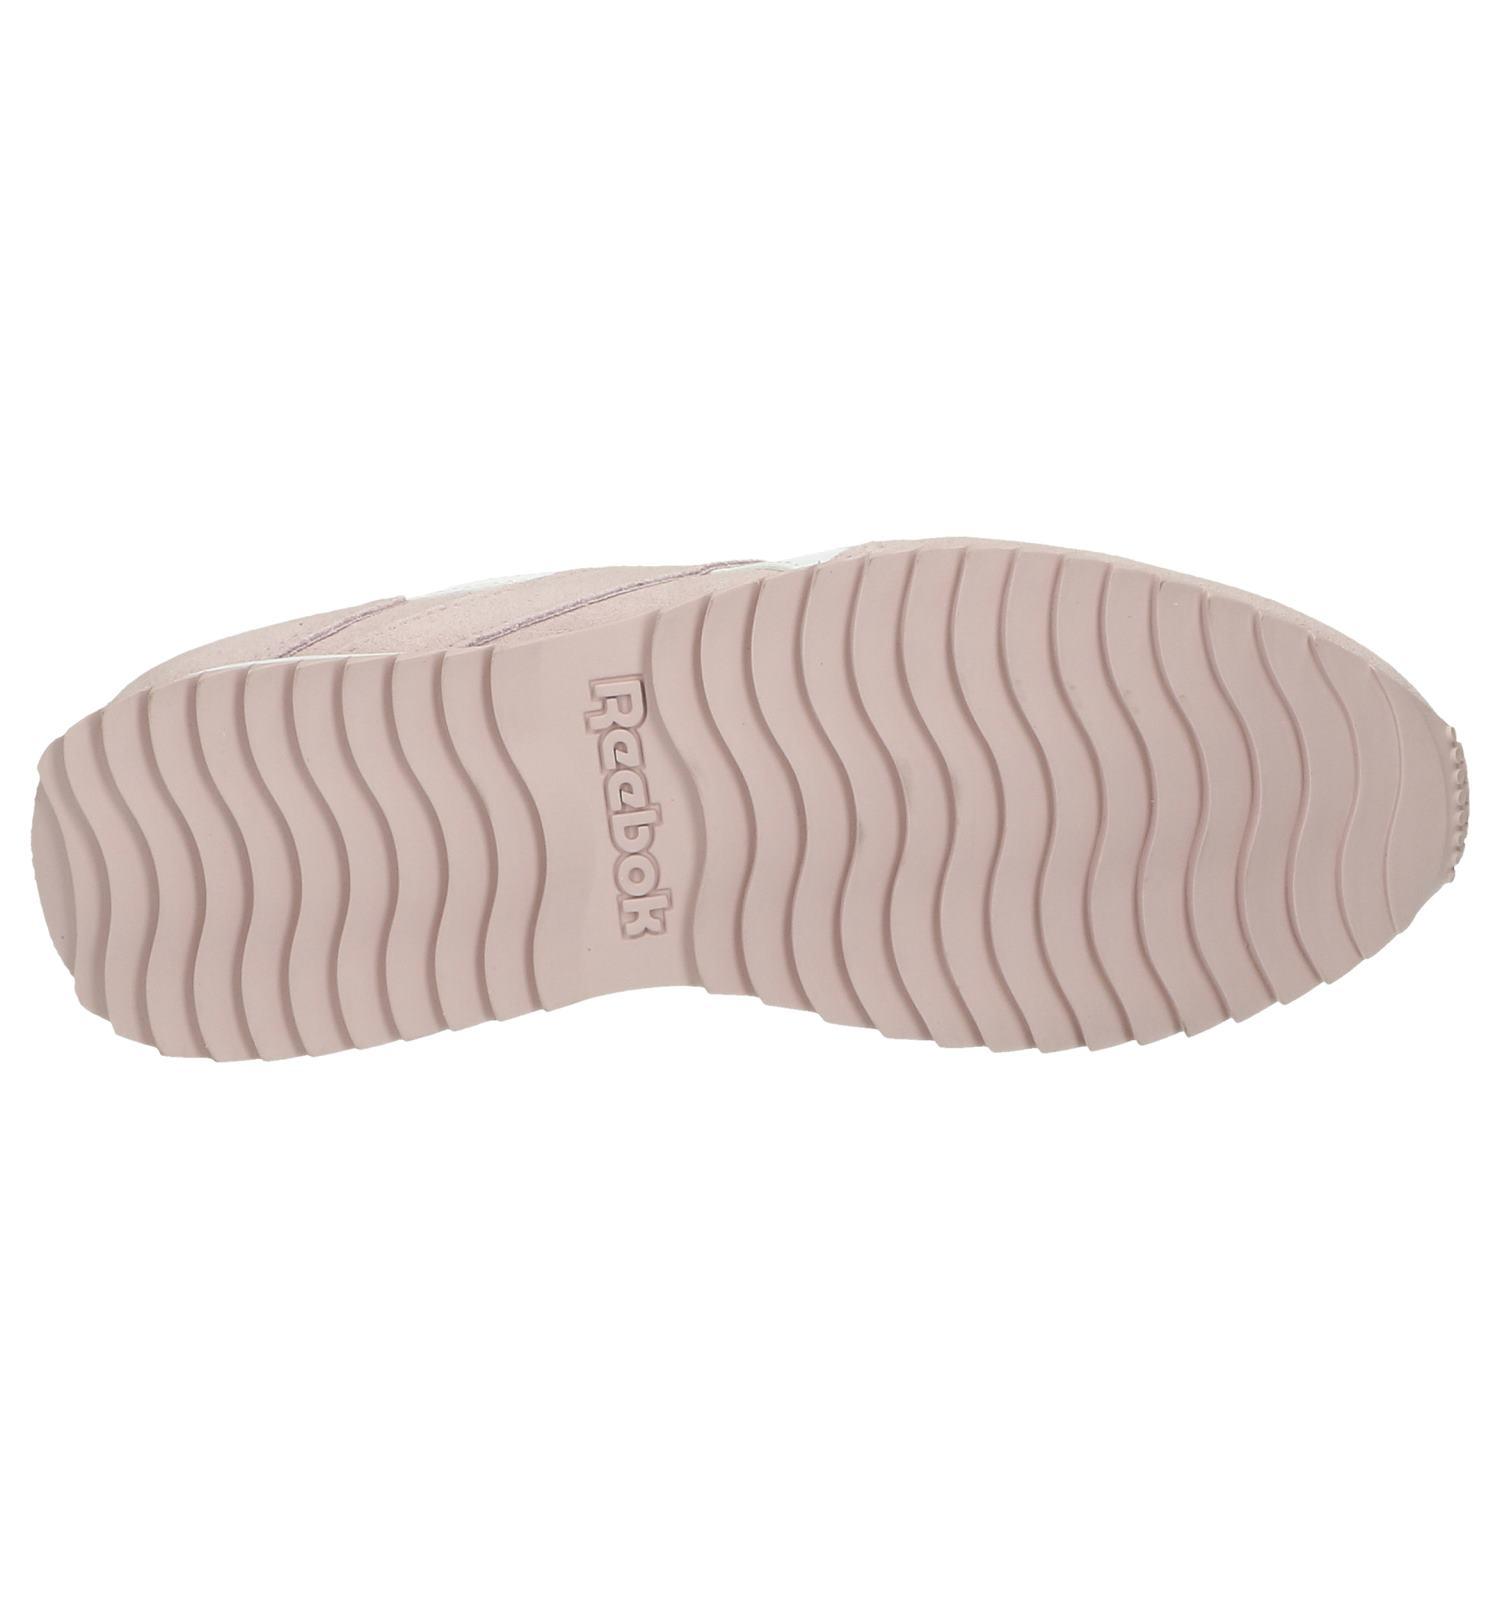 36e853ebc87 Roze Sneakers Reebok Royal Glide | SCHOENENTORFS.NL | Gratis verzend en  retour